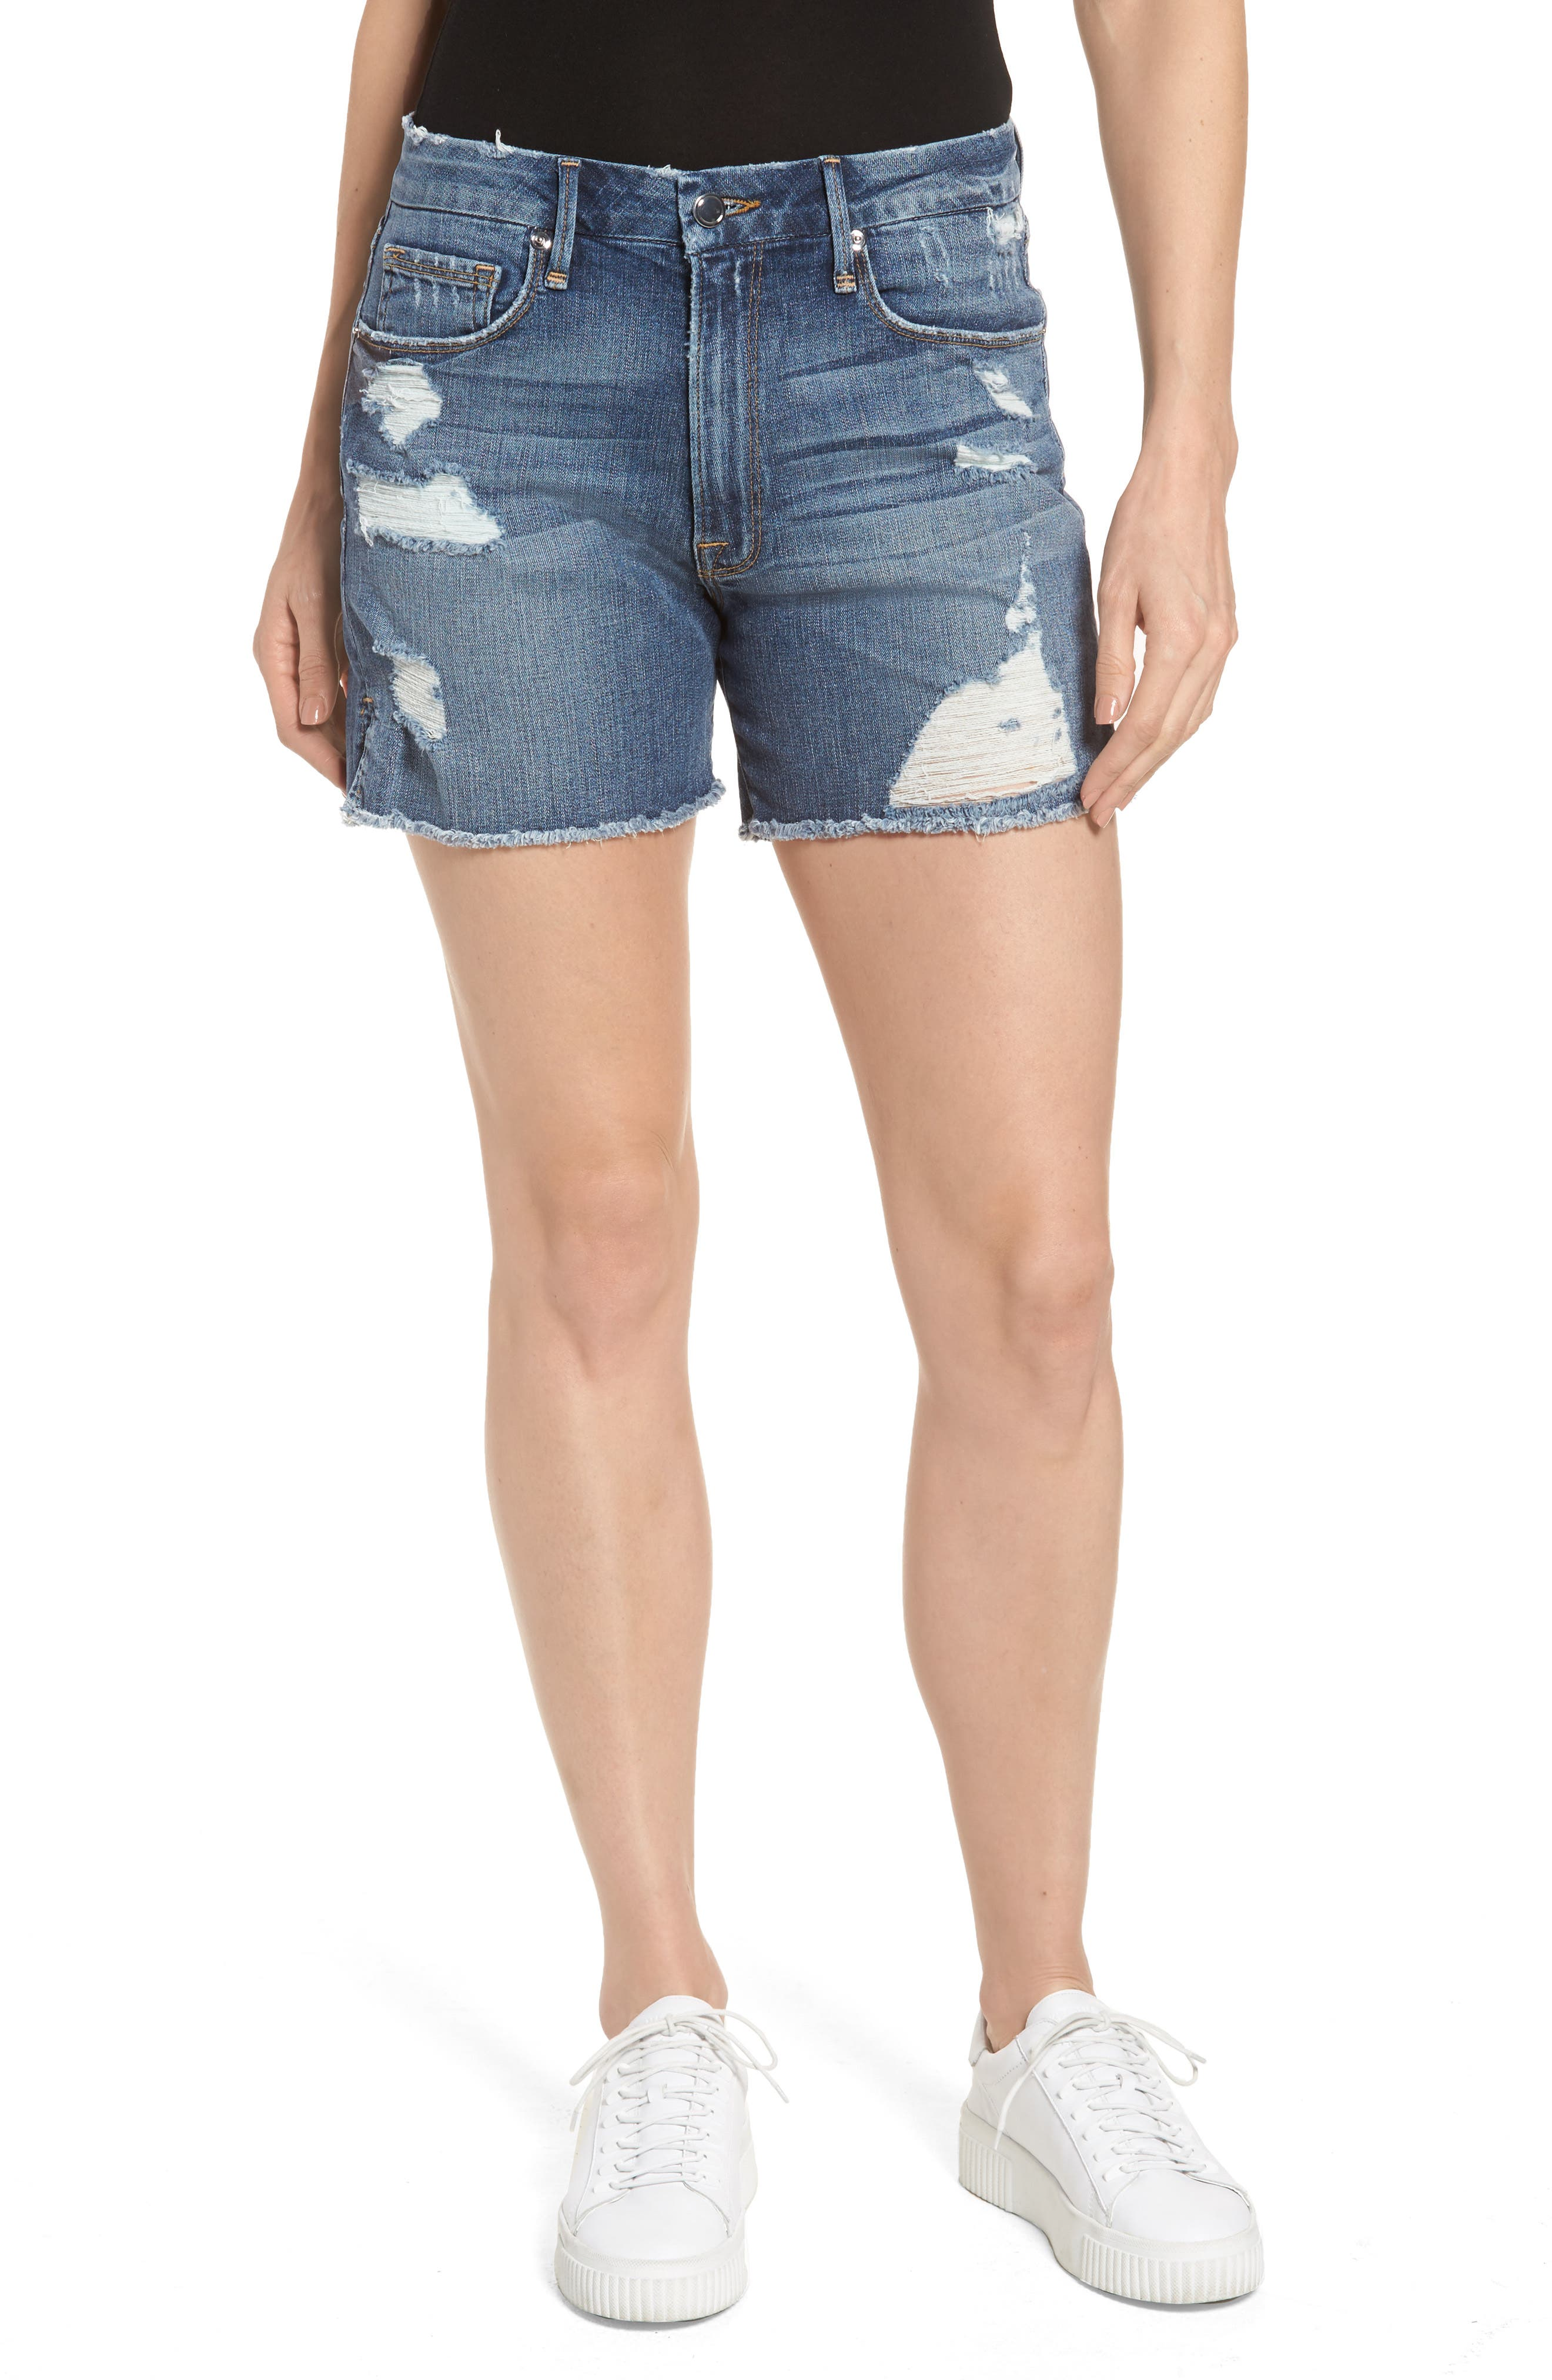 Good high waisted jean shorts